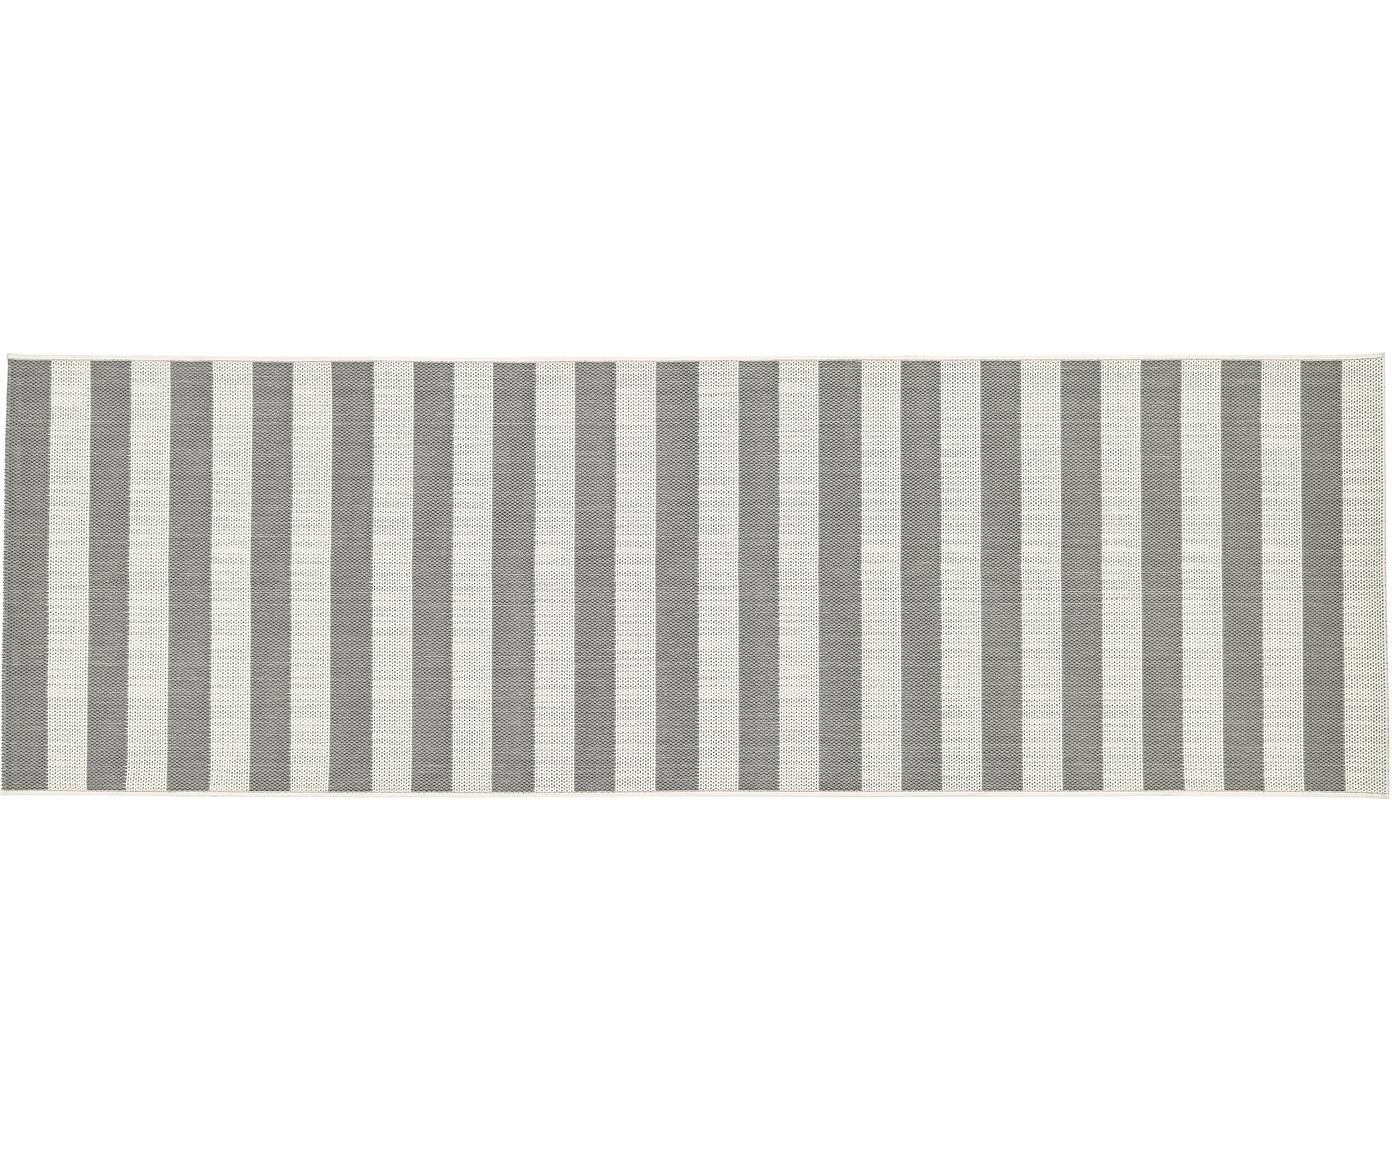 Alfombra de interior/exterior Axa, Parte superior: polipropileno, Reverso: poliéster, Blanco, gris, An 80 x L 250 cm